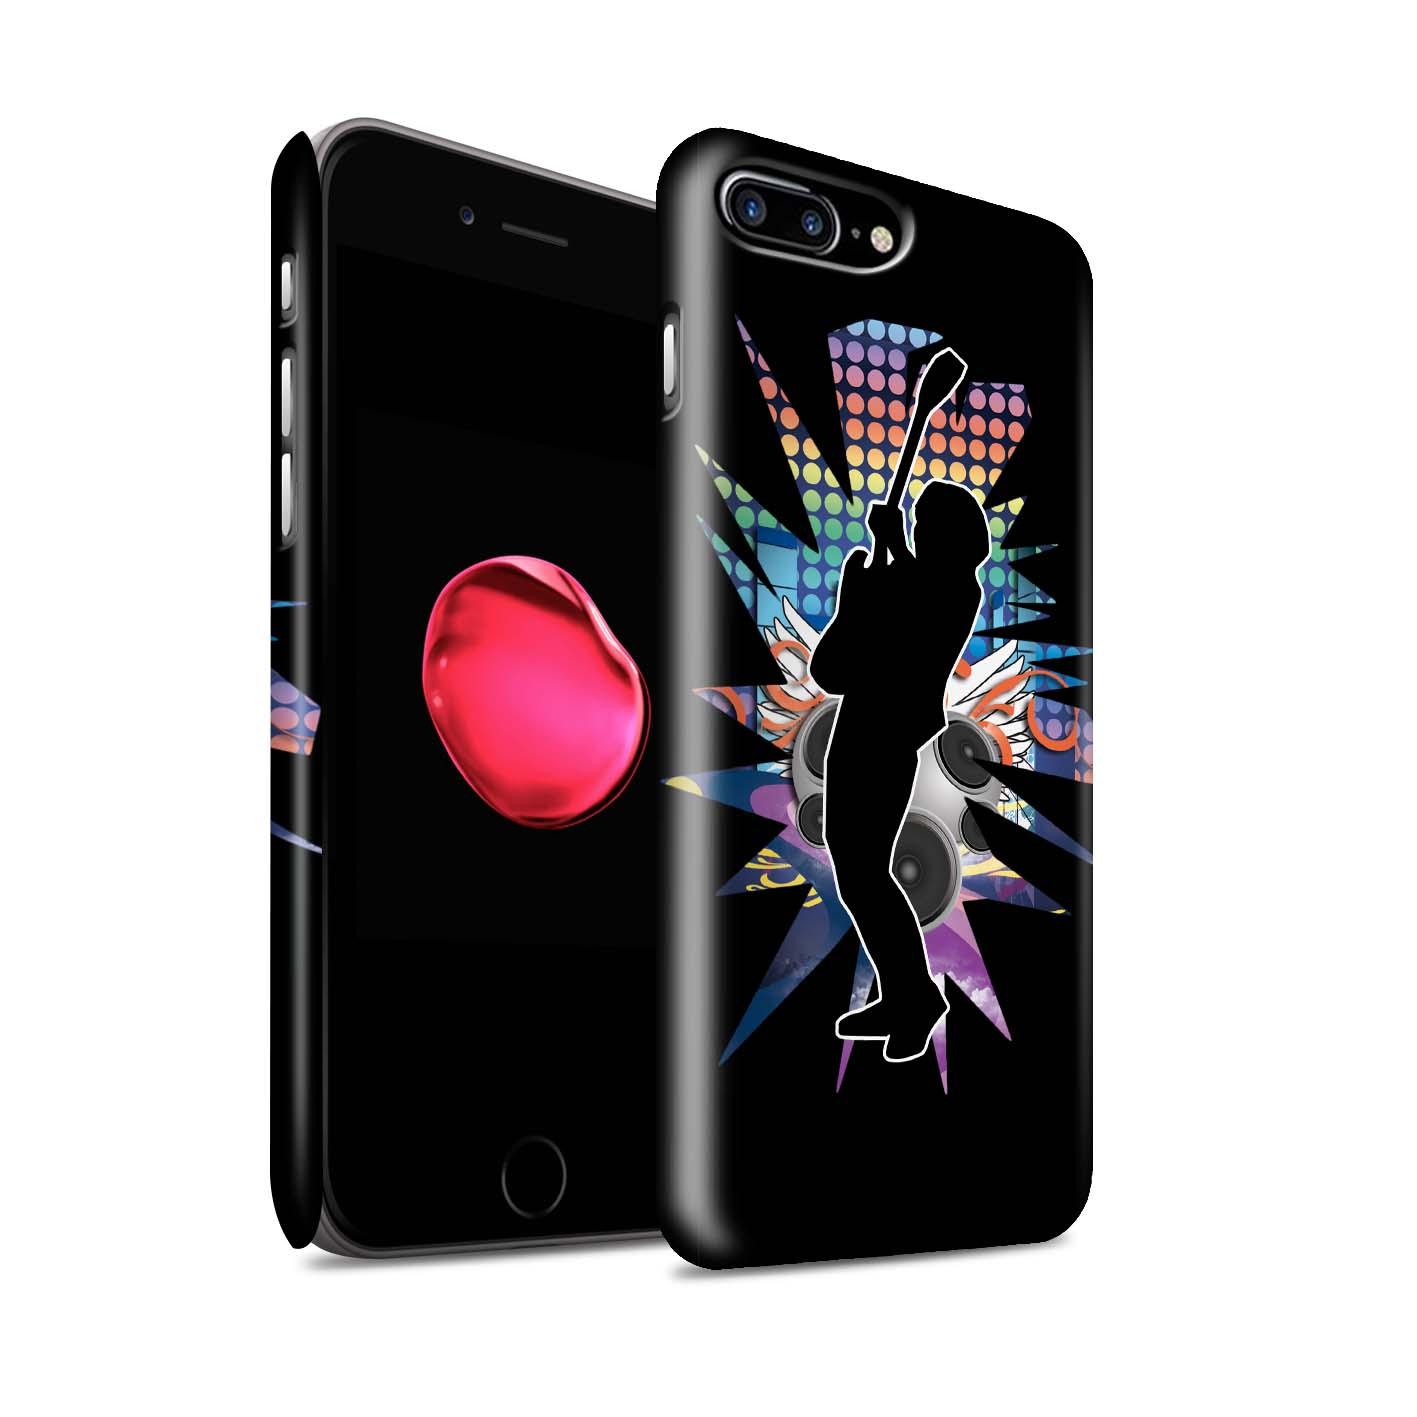 Coque-Etui-Matte-de-STUFF4-pour-Apple-iPhone-7-Plus-Rock-Star-Pose